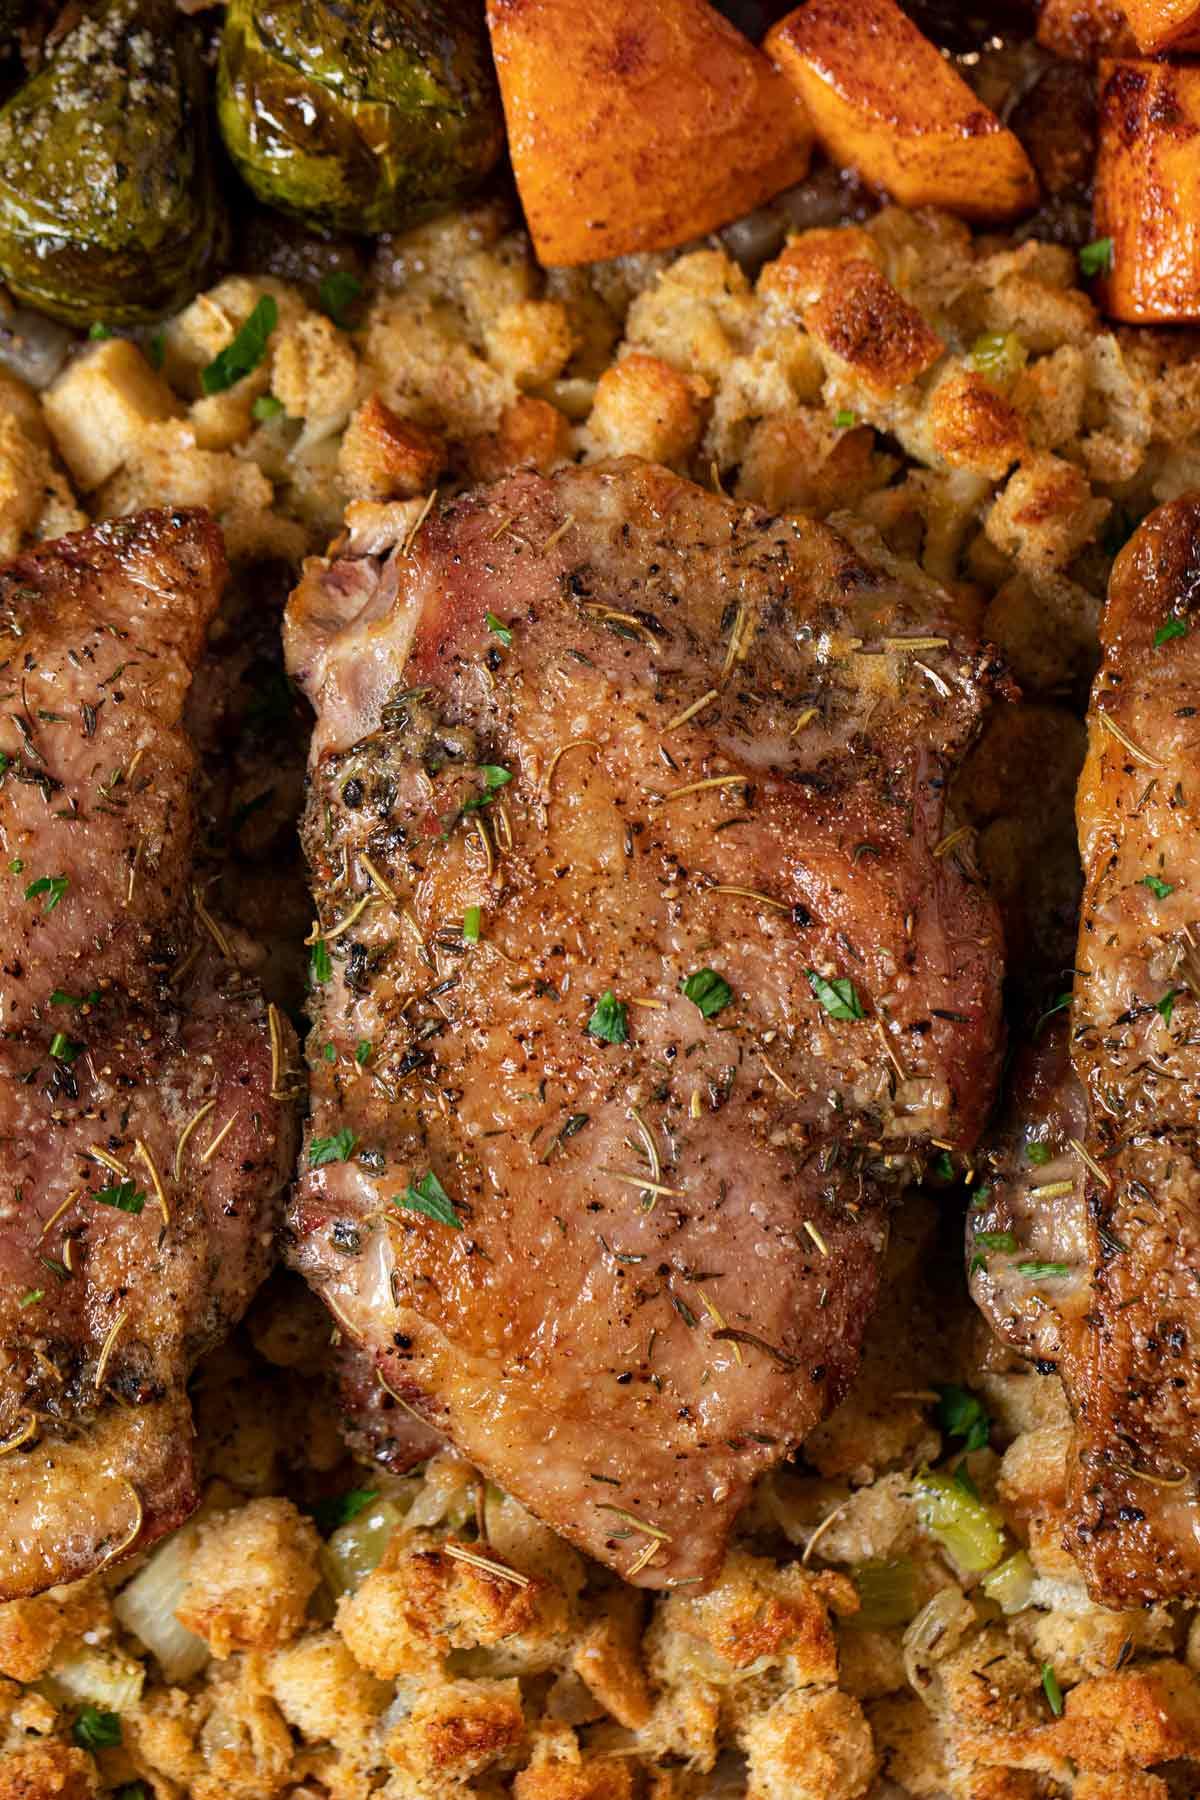 Sheet Pan Thanksgiving Dinner close up of turkey thighs